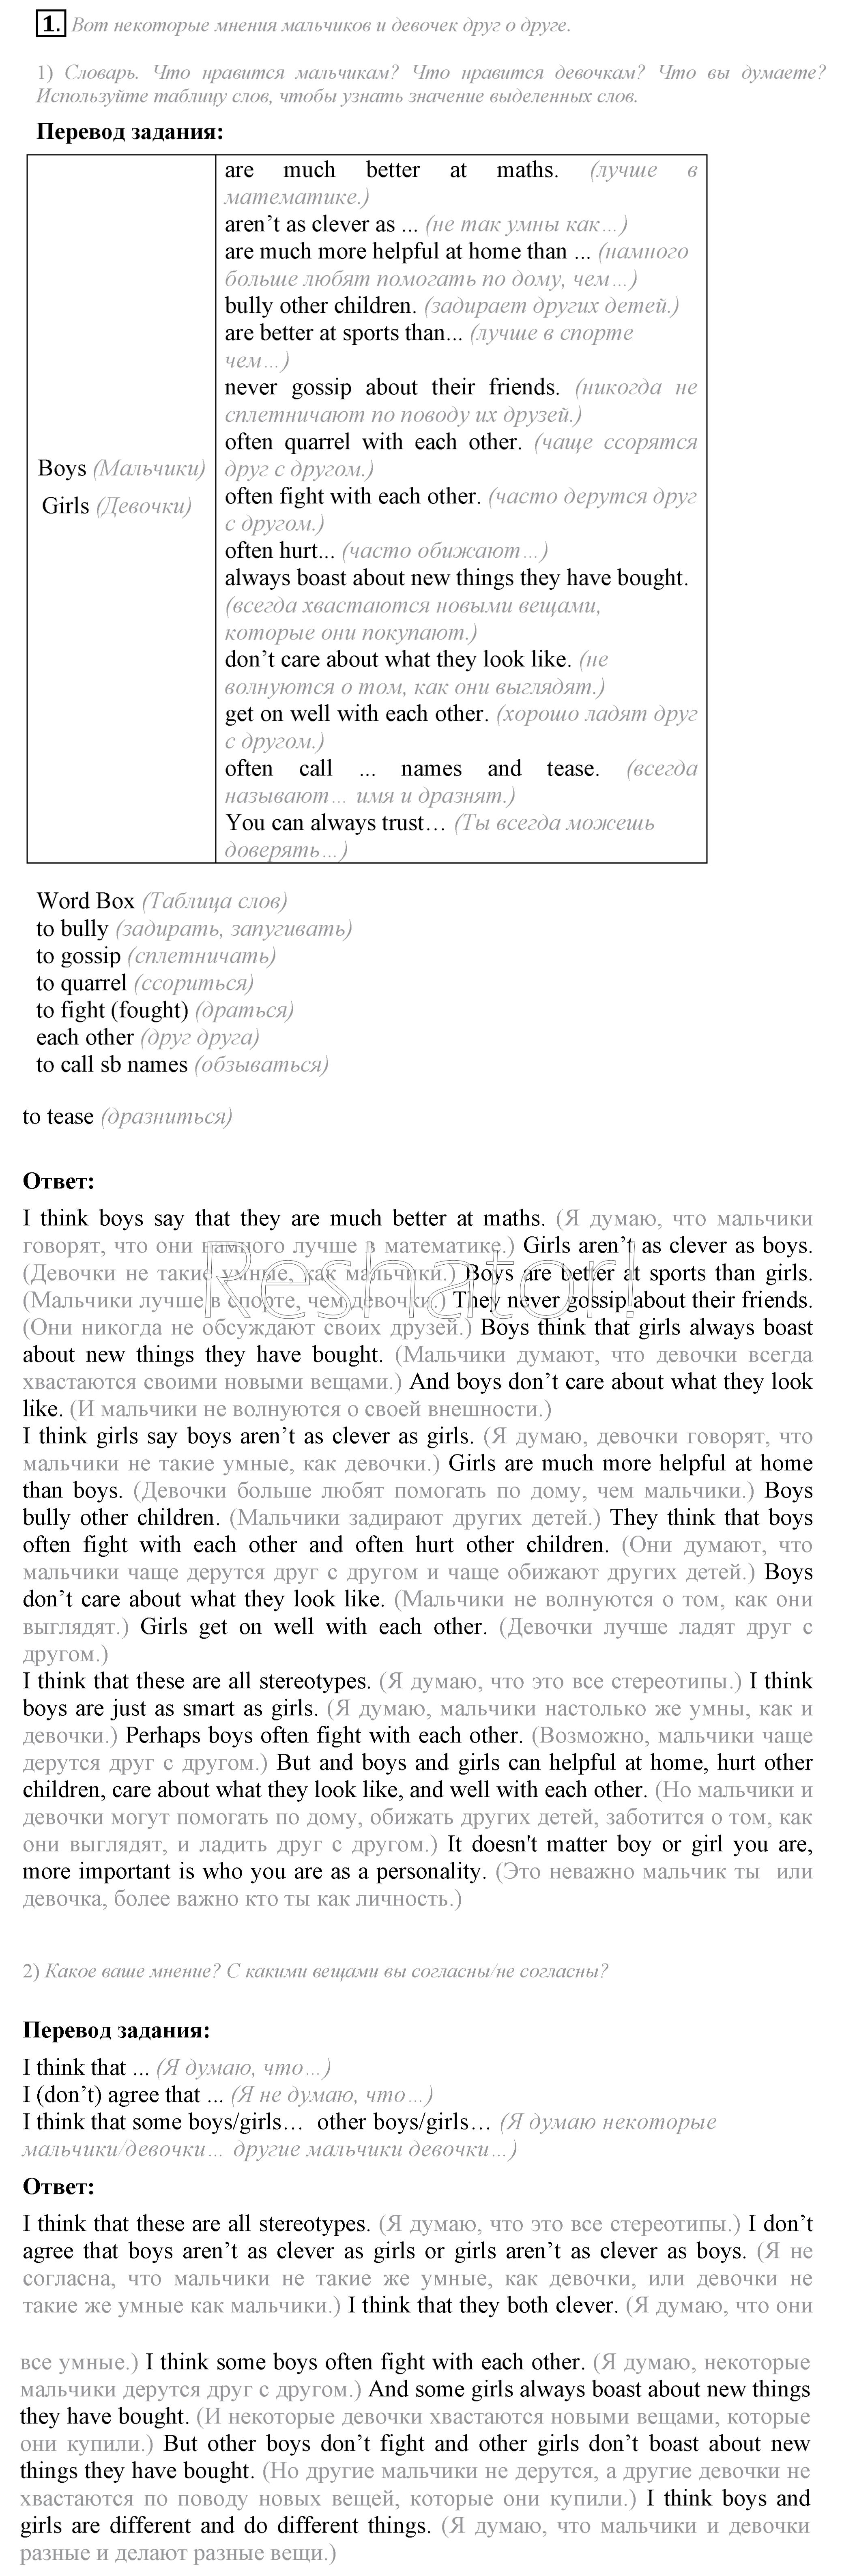 английский язык 6 класс страница 19